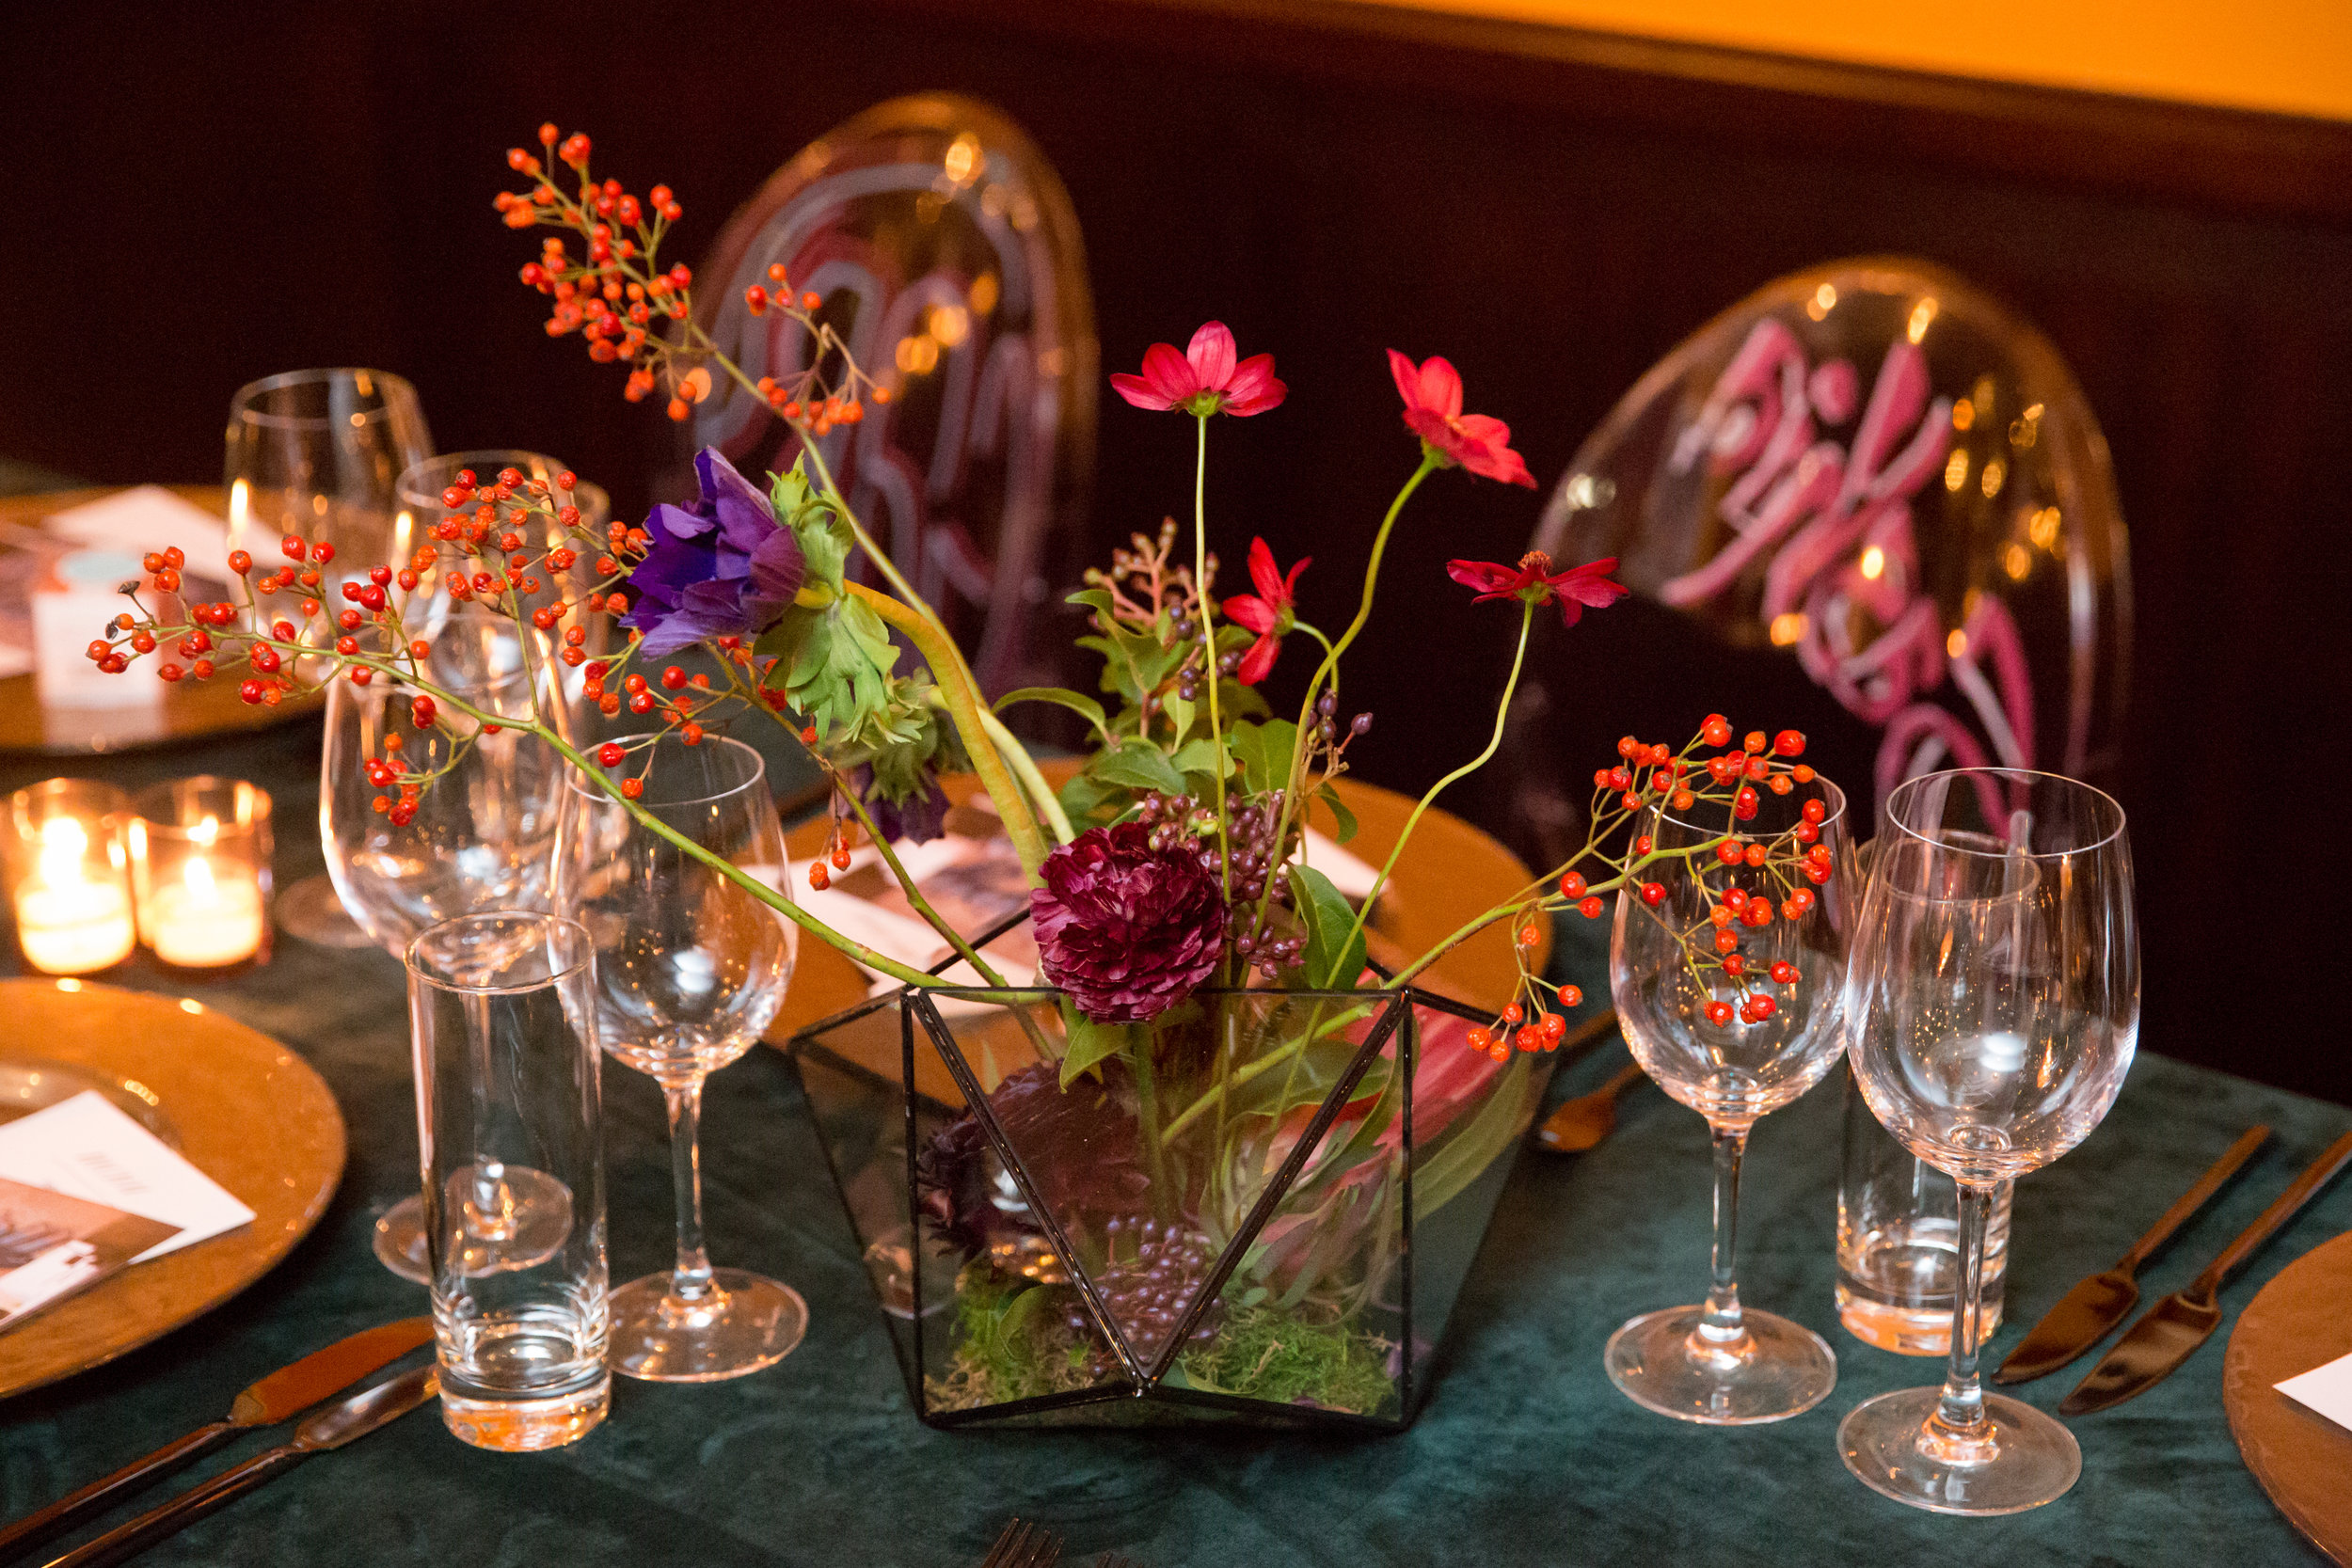 Gramercy-Park-Hotel-Holiday-Party-Andrea-Freeman-Events-7.JPG